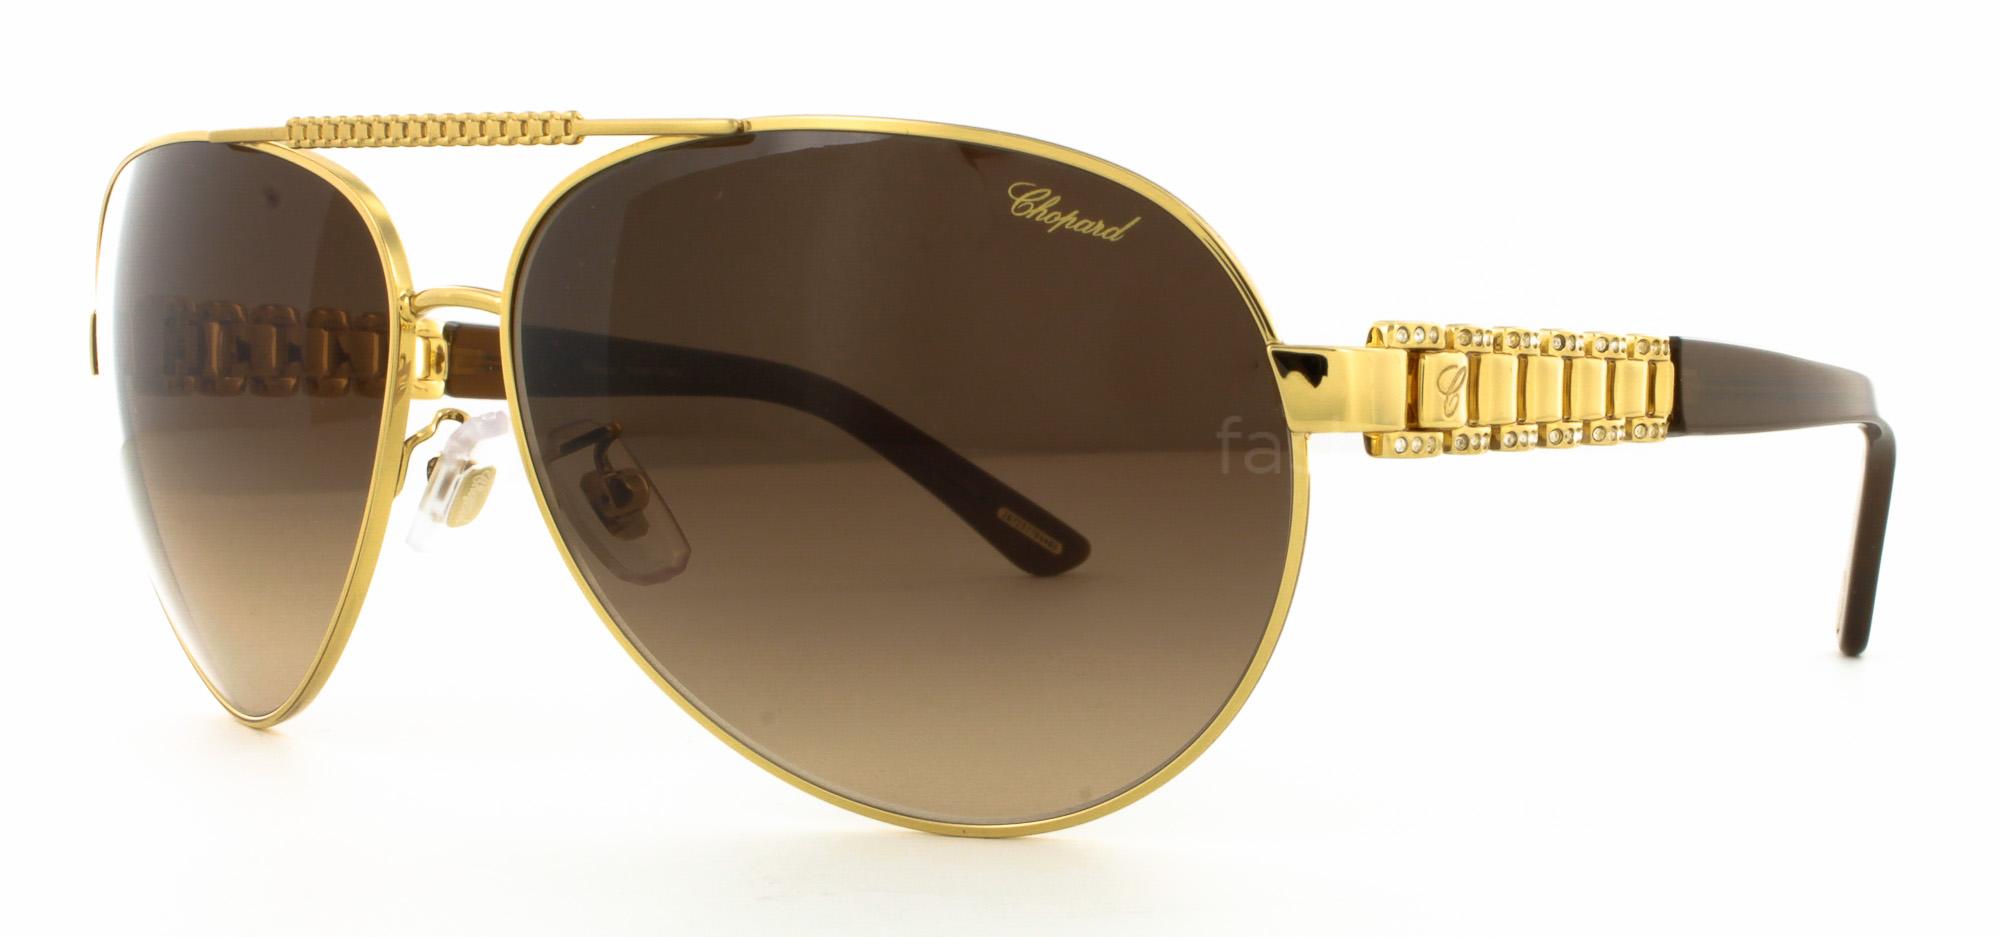 aa34455e7c Carrera Sunglasses Amazon Uk « One More Soul